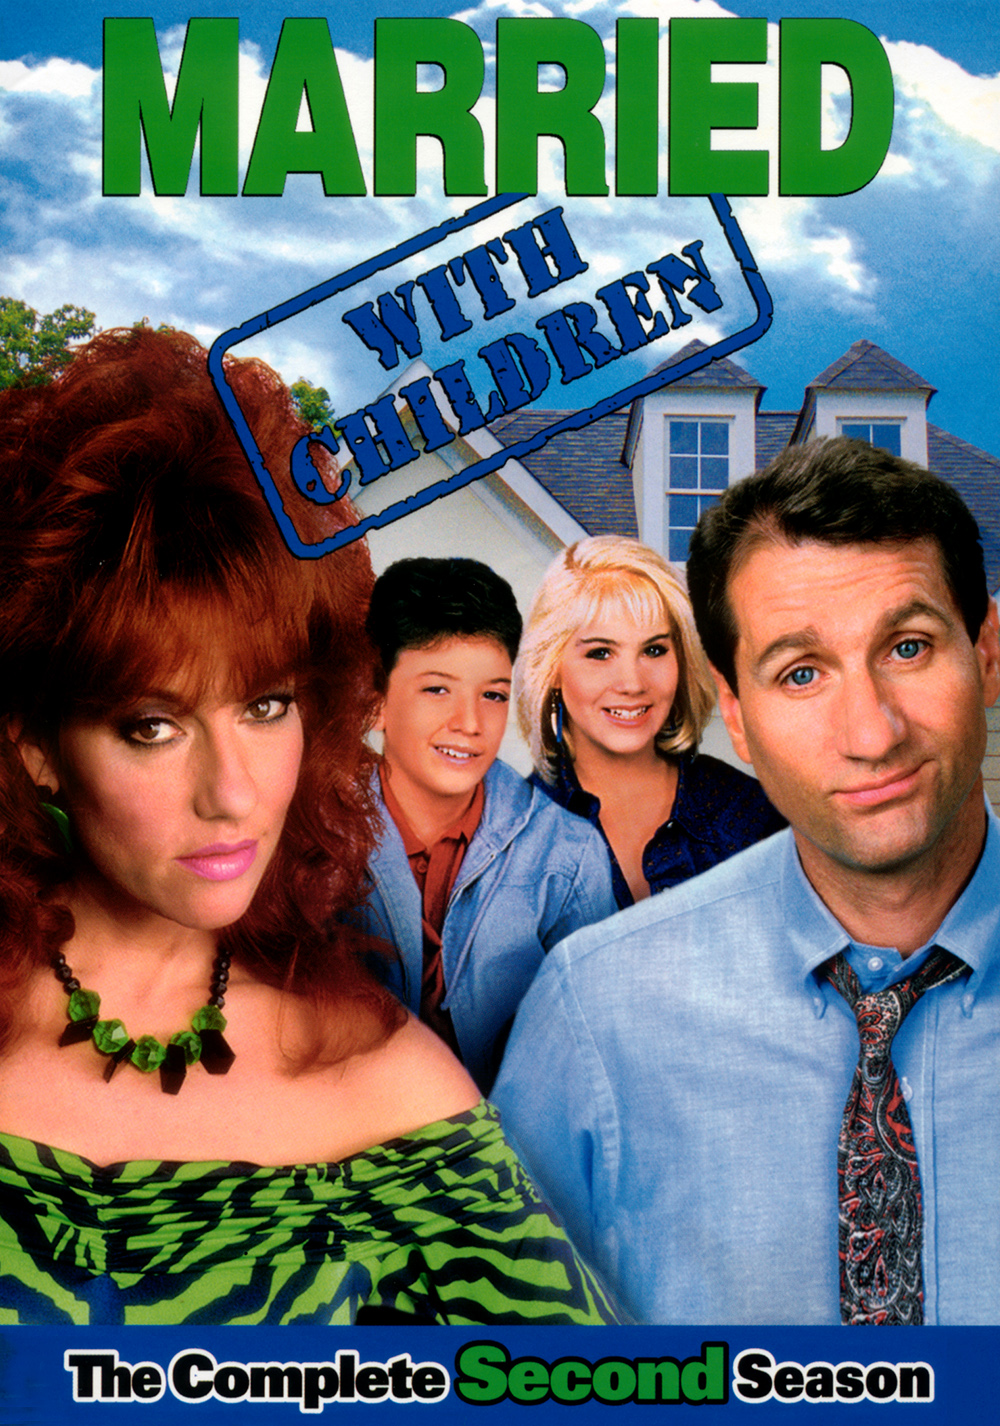 Married with Children (1987-1997) | Married with children